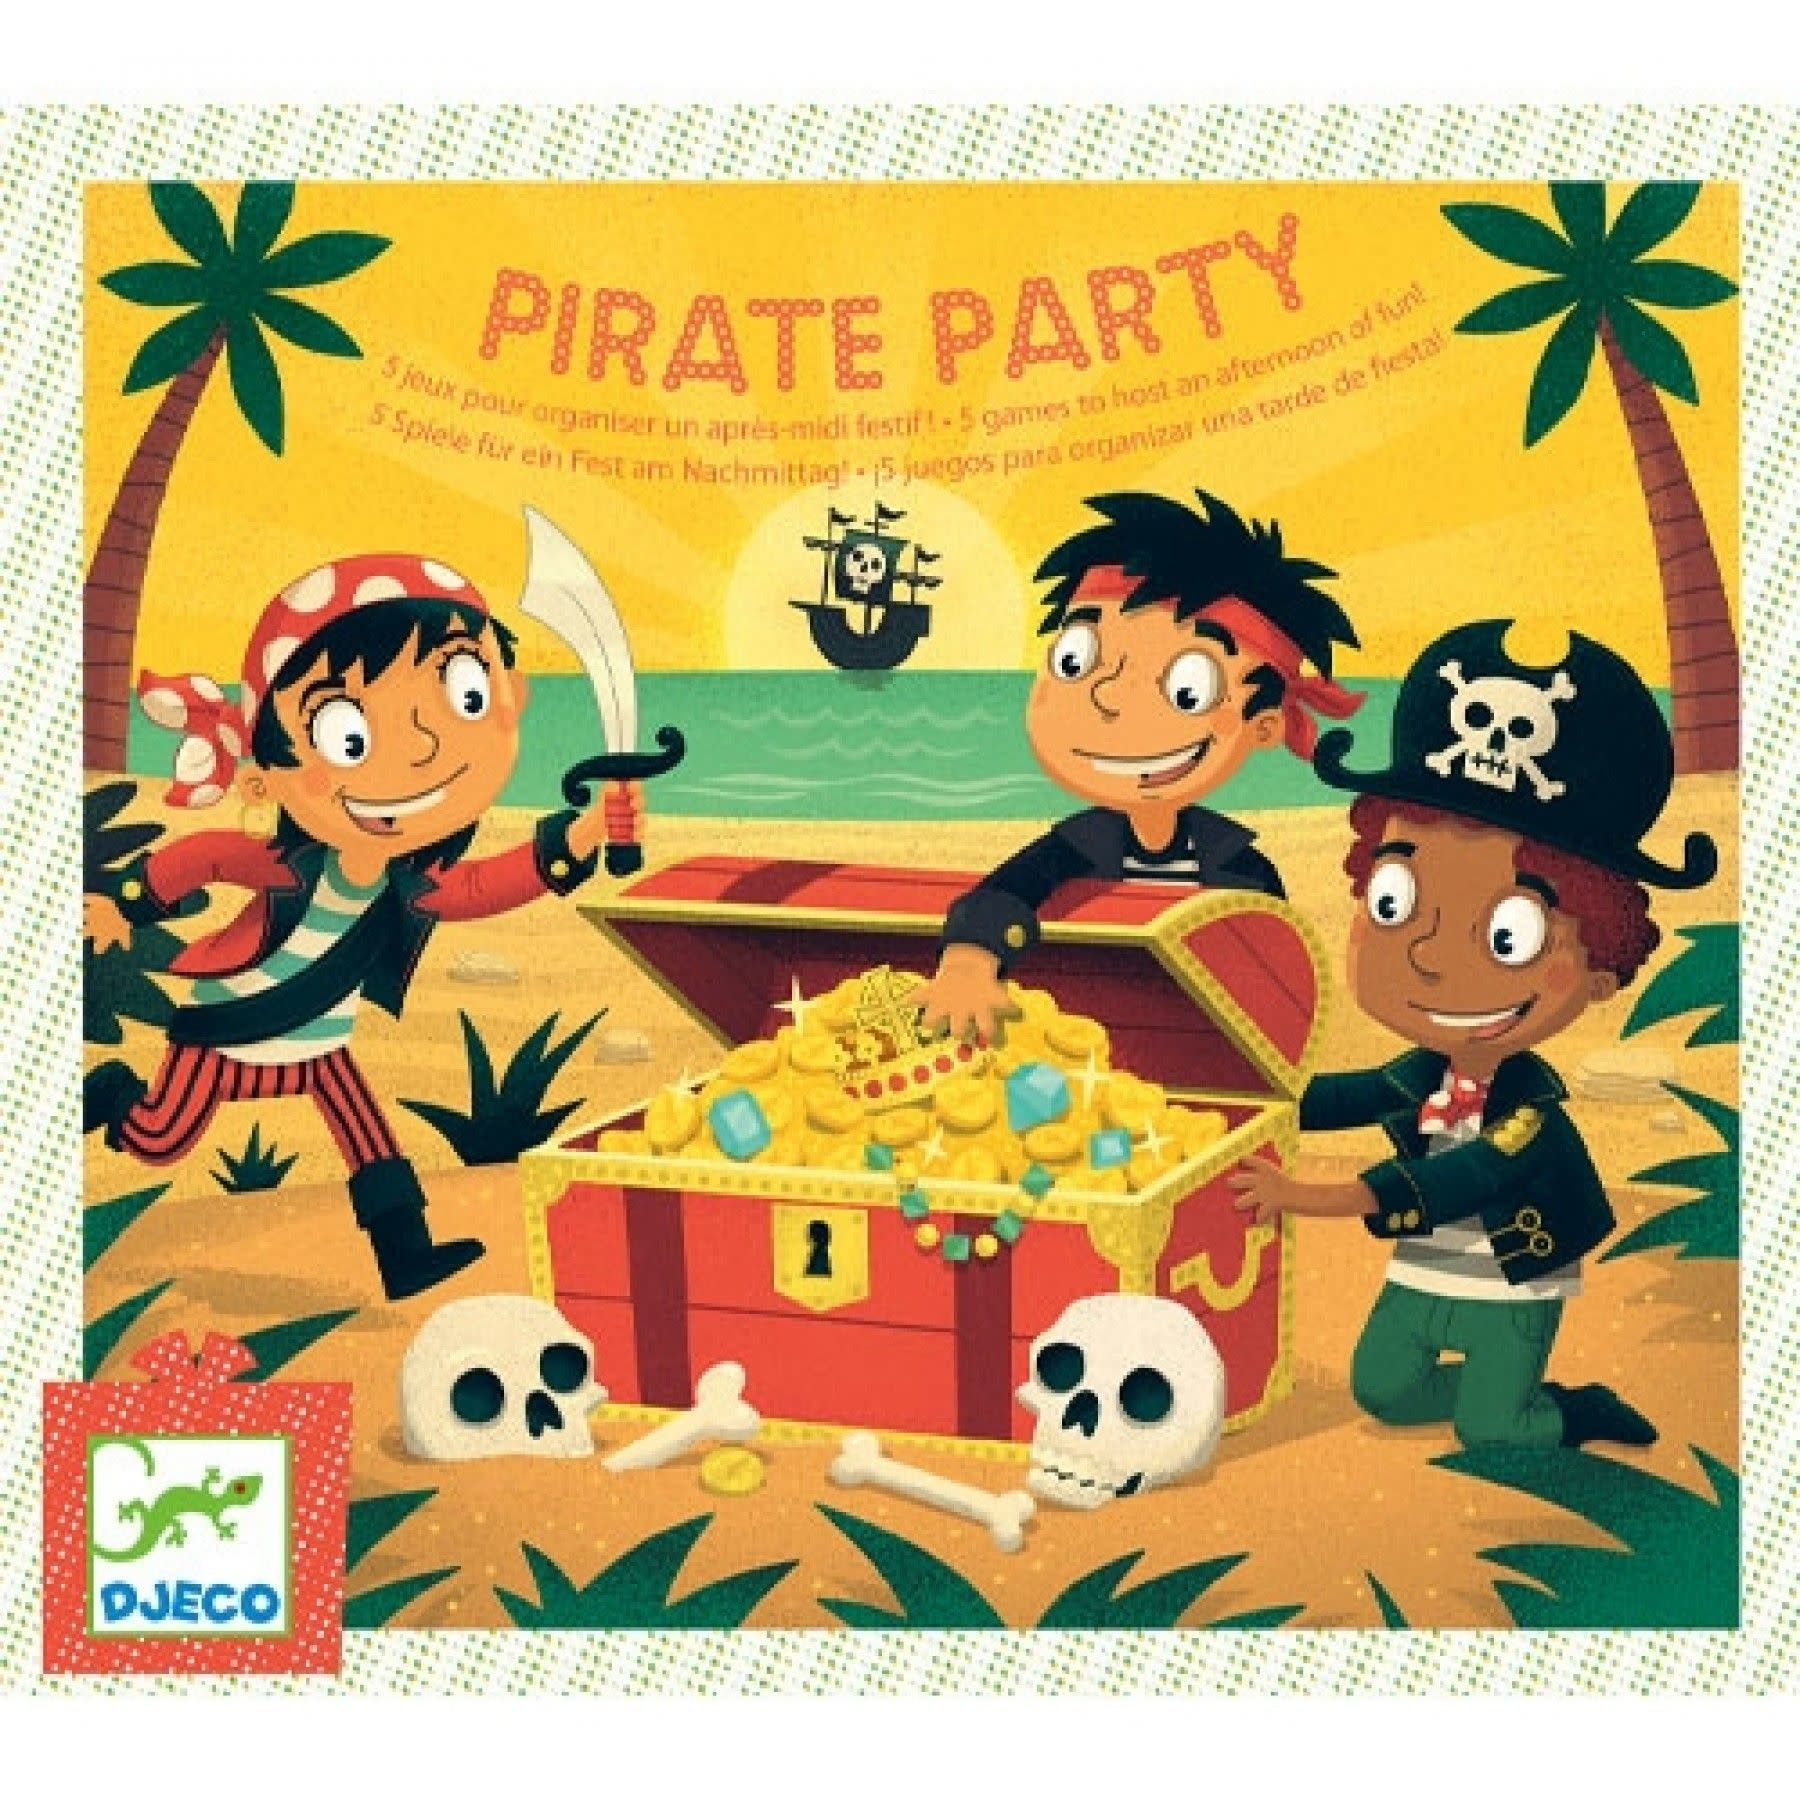 Djeco Djeco - Pirate party